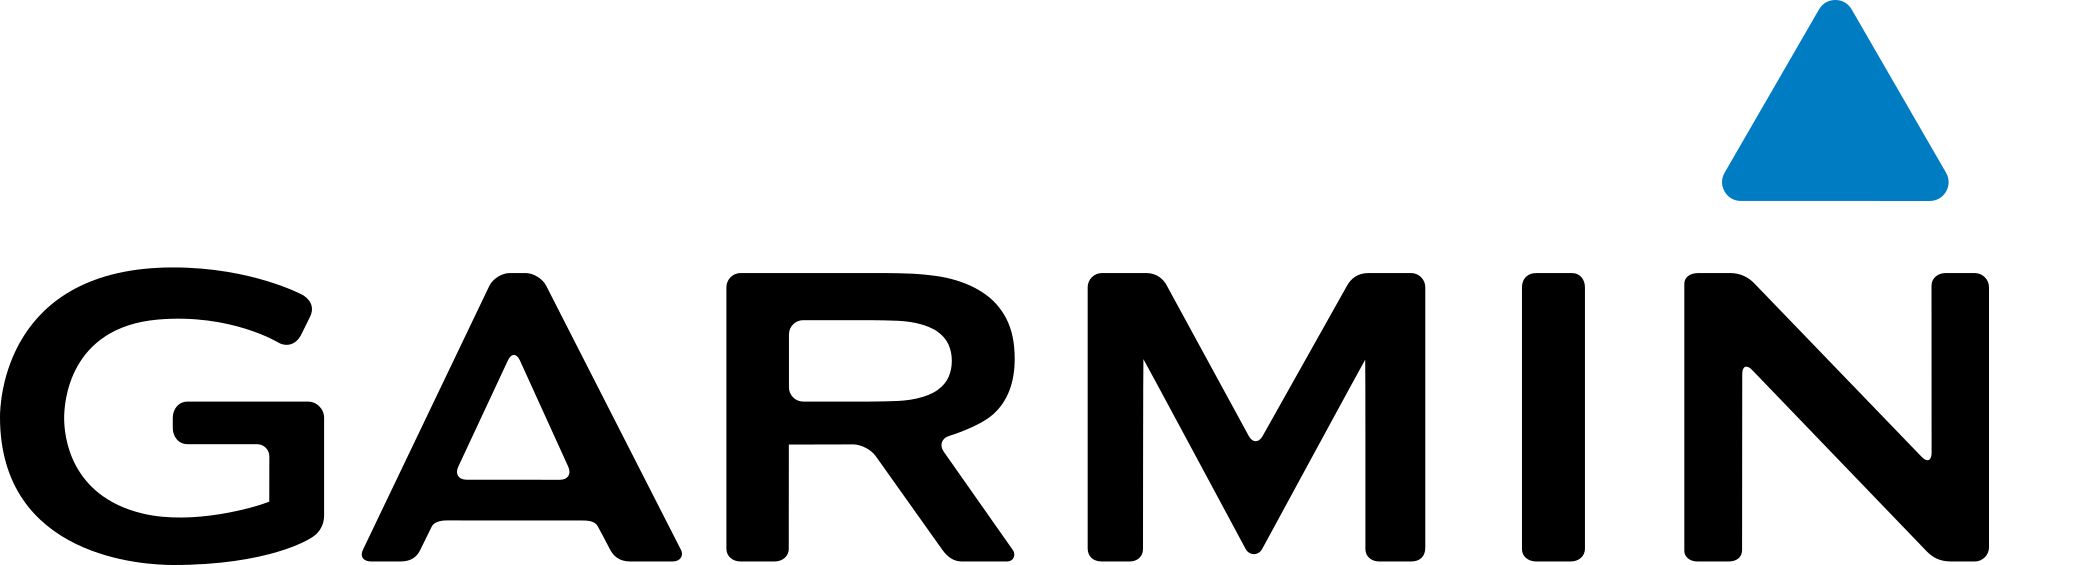 Garmin-logo-3